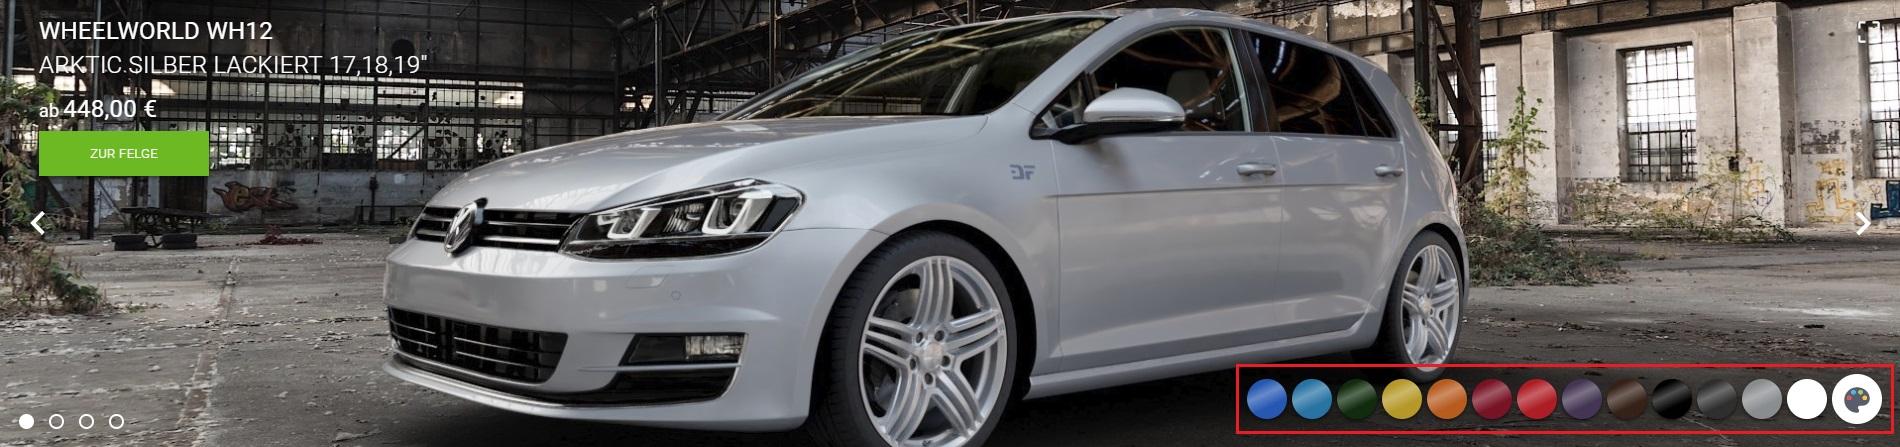 3D Felgenkonfigurator Fahrzeugfarbe wählen